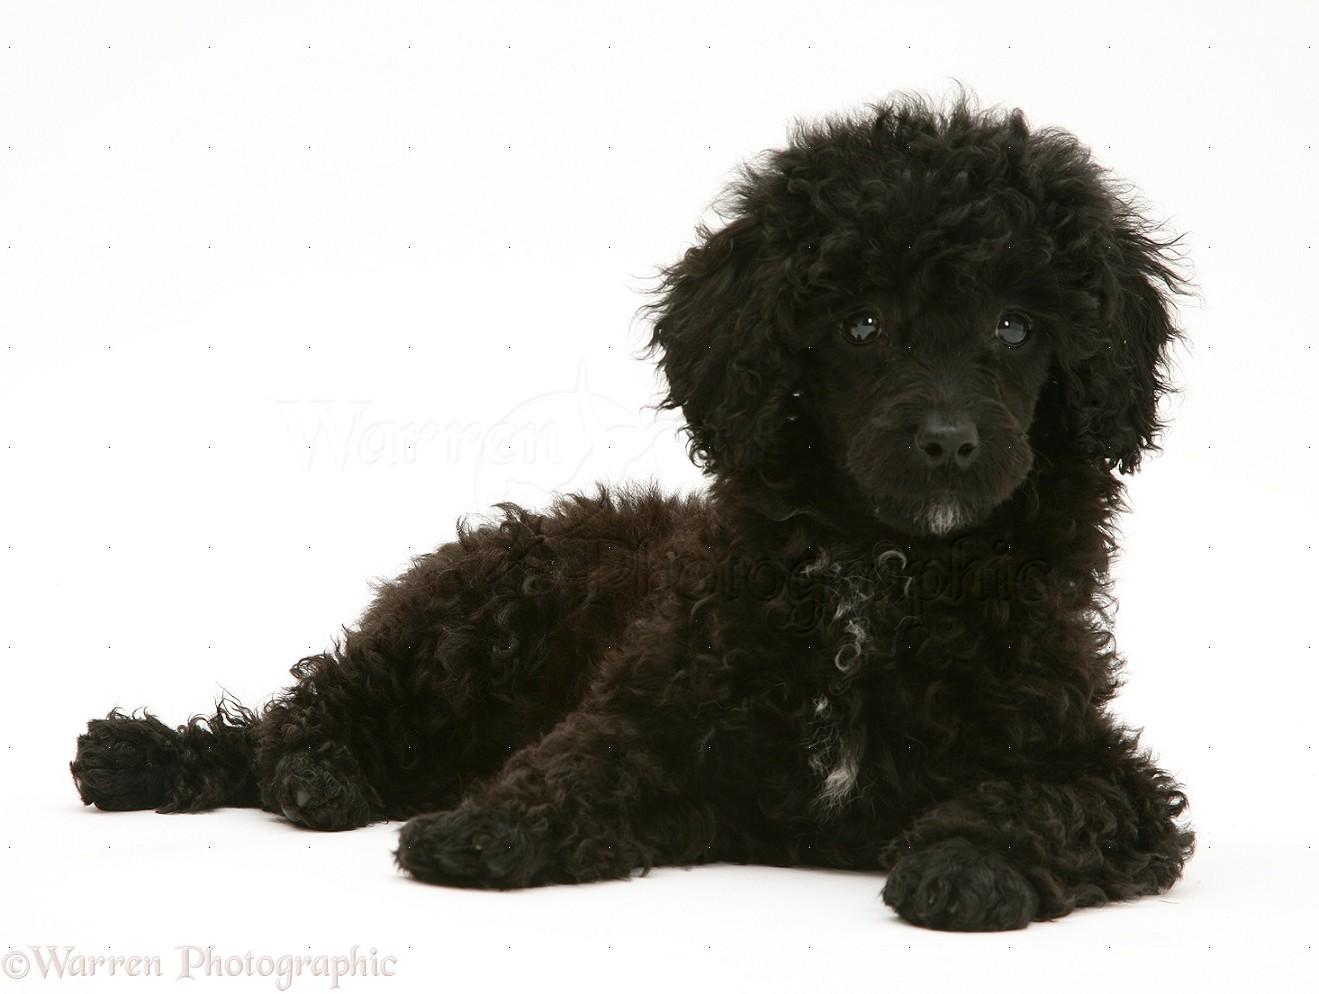 Dog: Black Miniature Poodle lying with head up photo WP17216